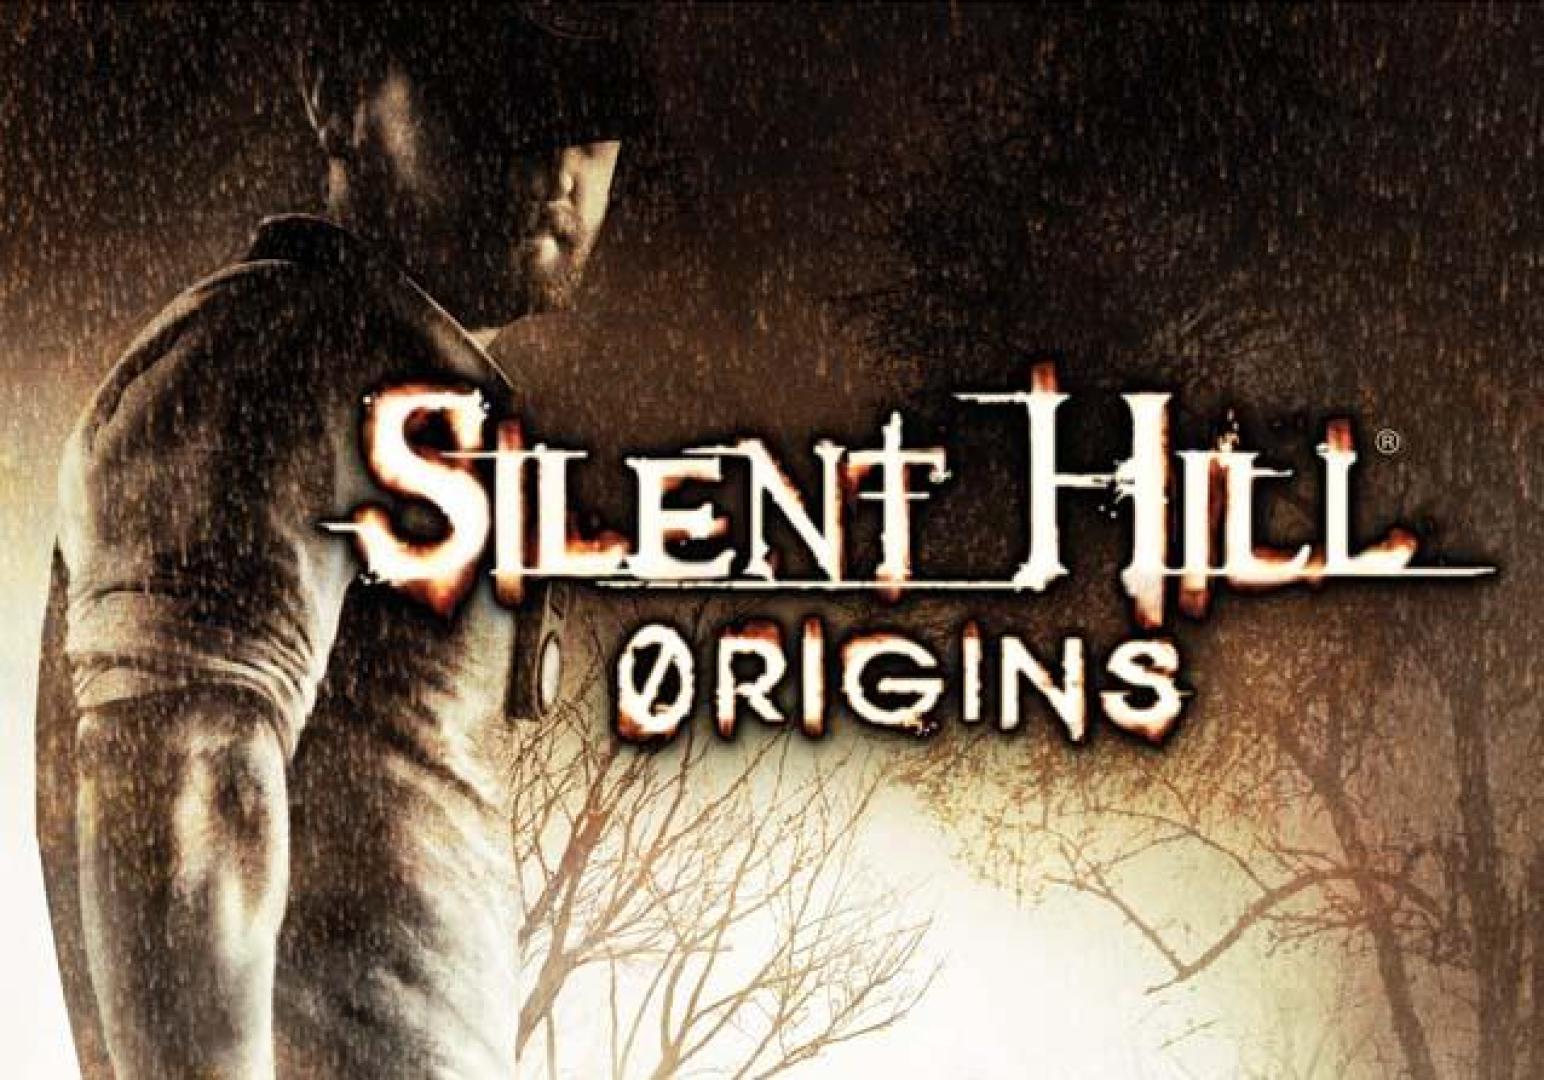 Silent Hill - Origins